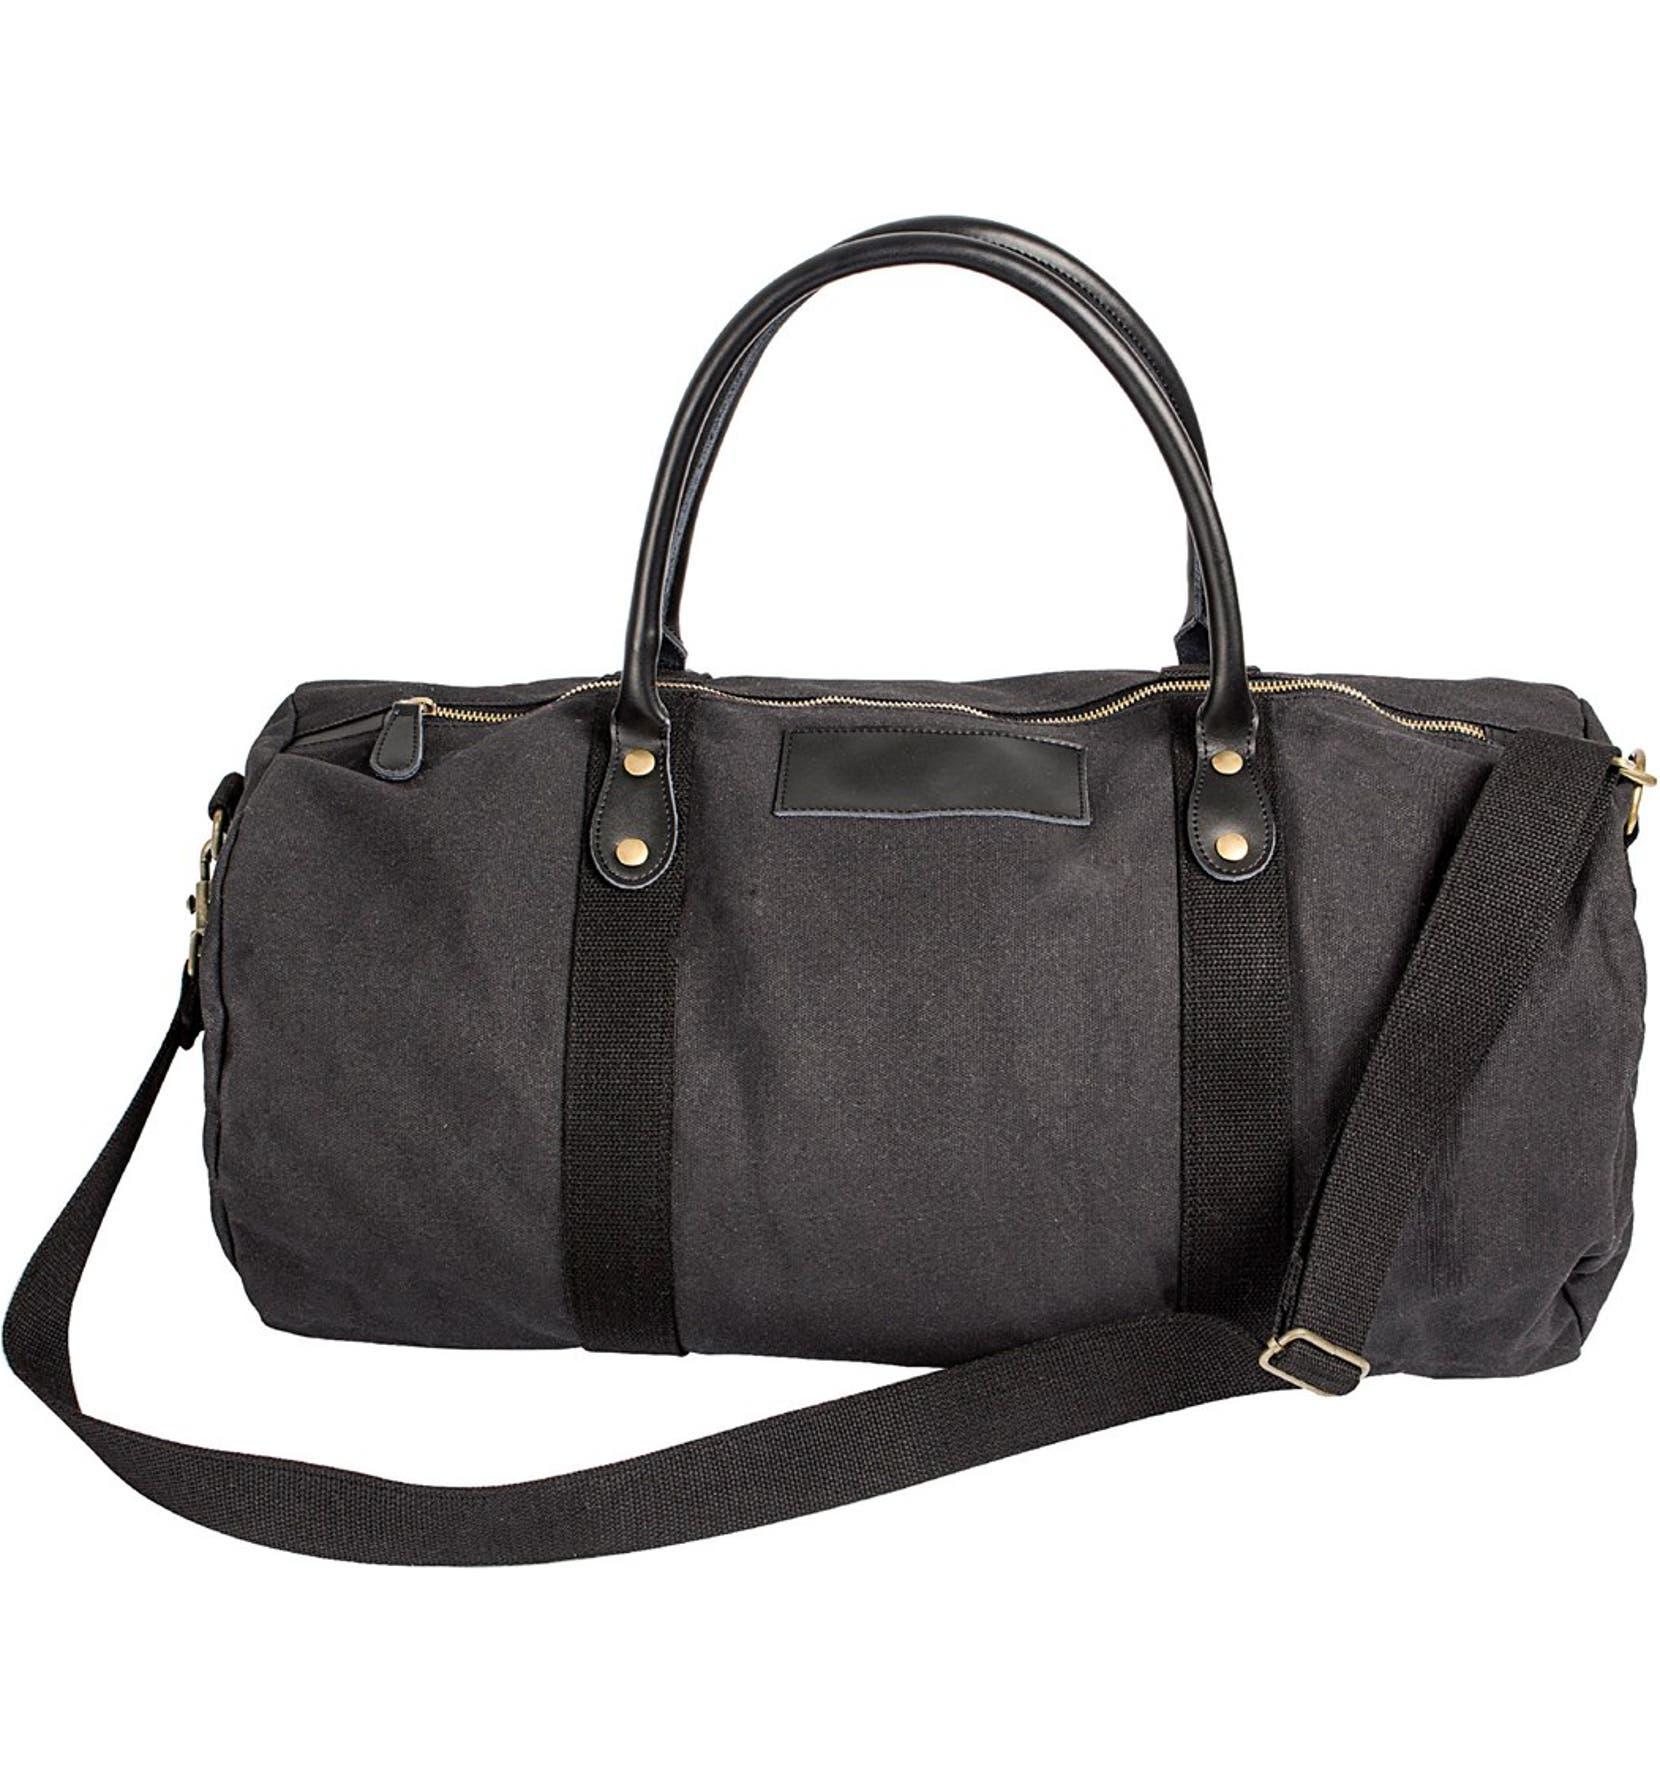 c34f3117f7c5 Cathy s Concepts Monogram Duffel Bag